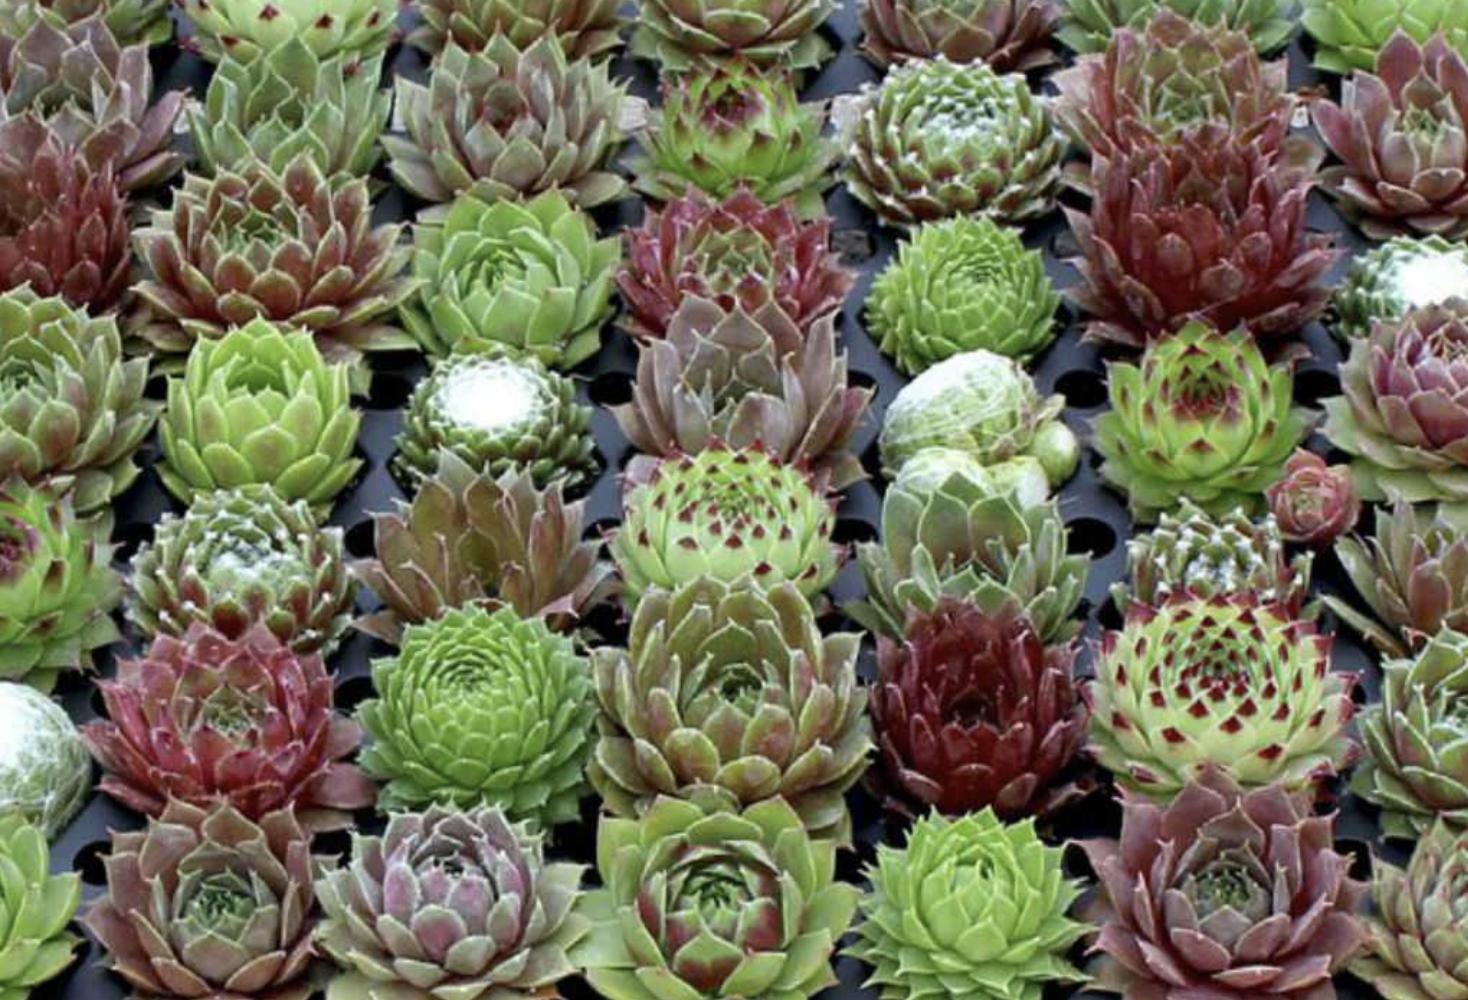 Sempevivums are popular indoor plants